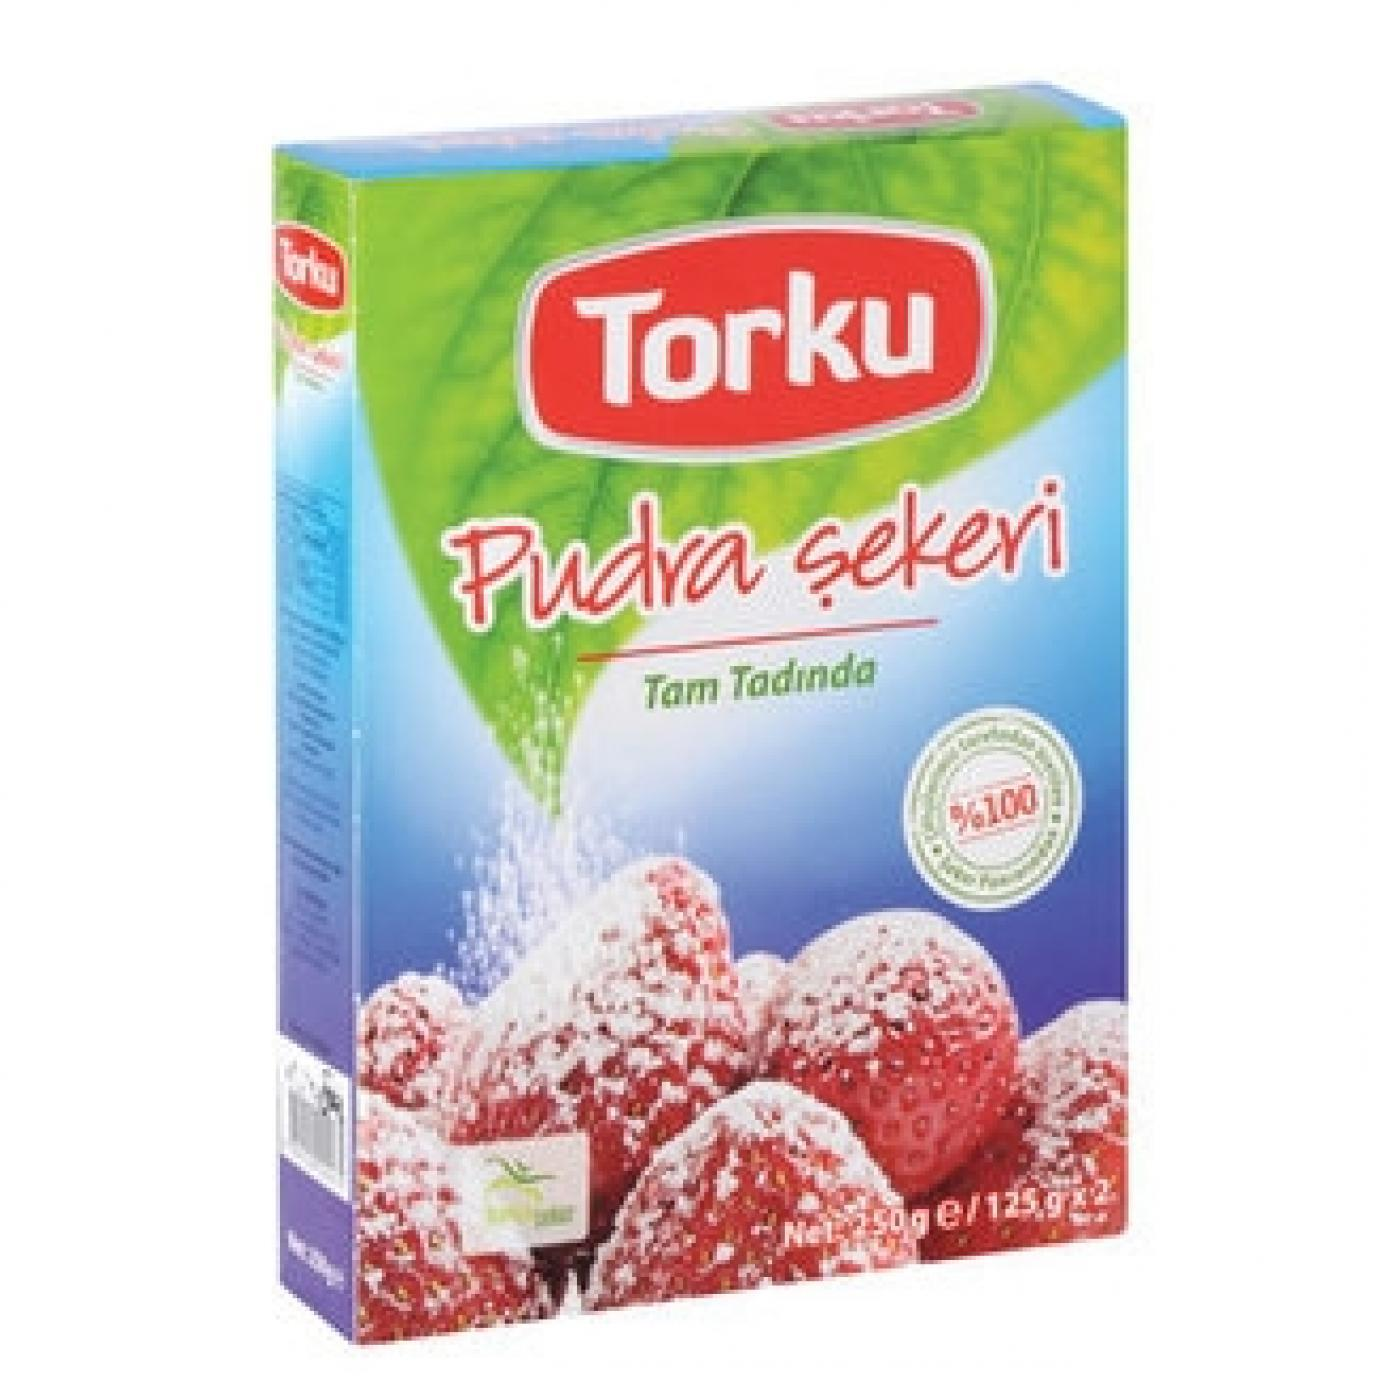 TORKU PUDRA ŞEKERİ 250GR